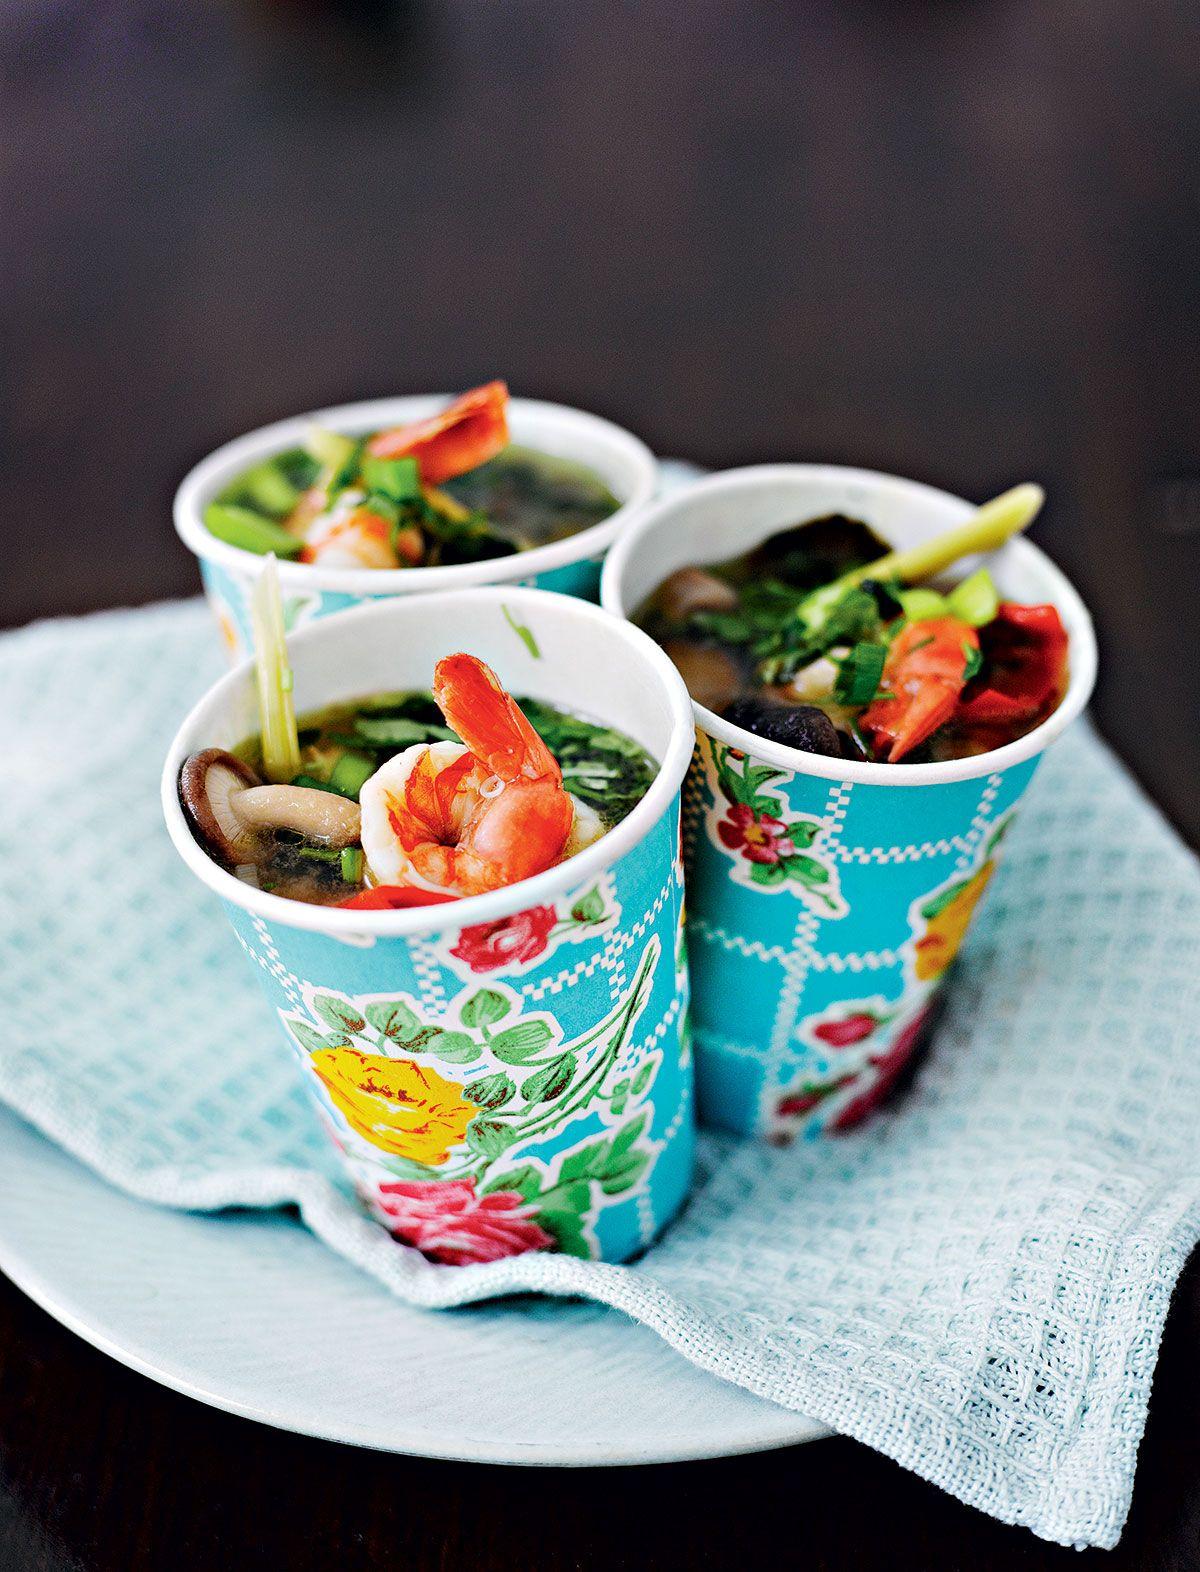 Resepti: Koukuttava tom yam